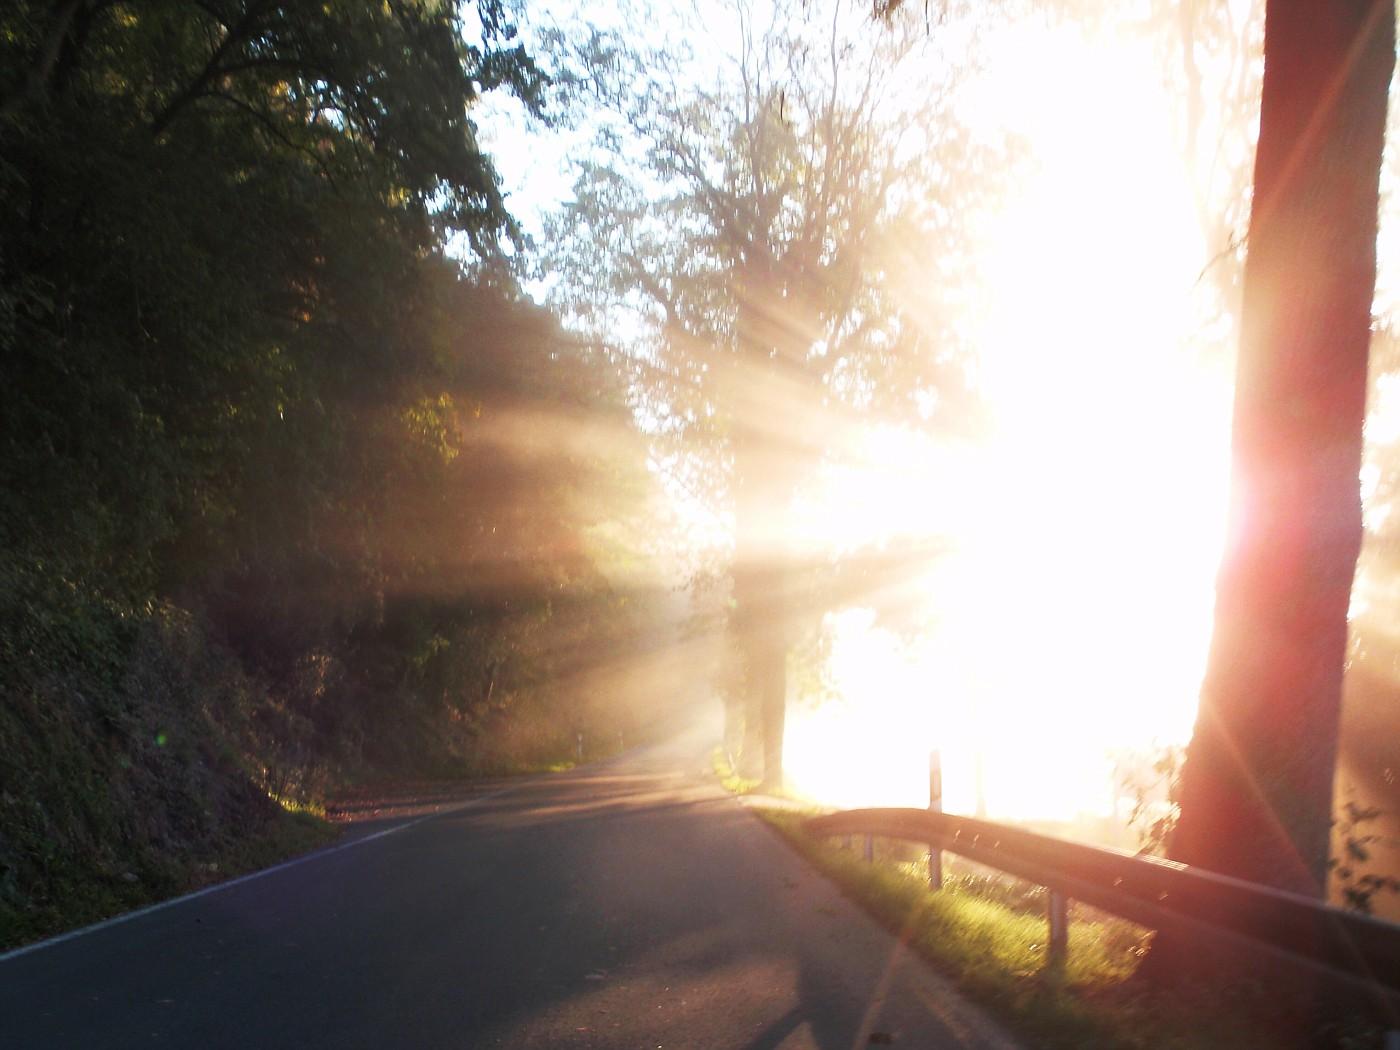 Die Sonne verbrennt die Reste des Nebels